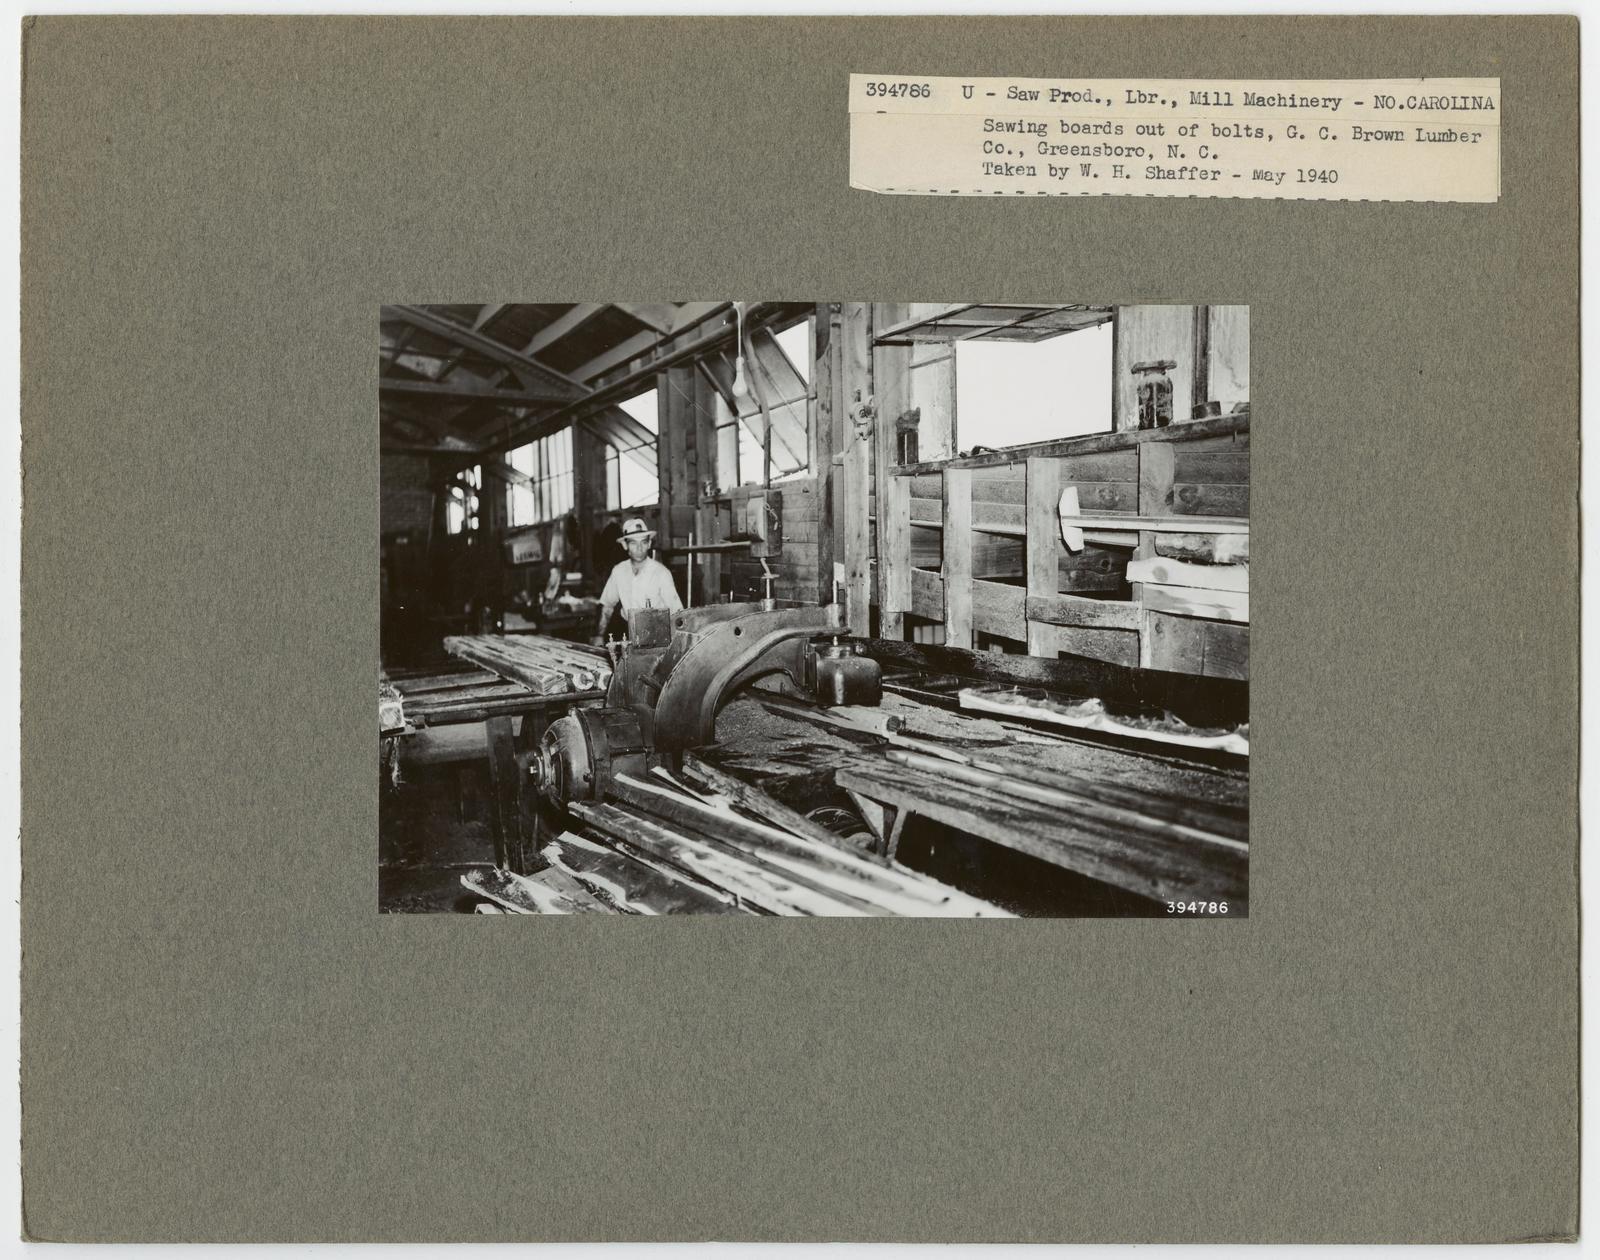 Sawmill Interiors - North Carolina